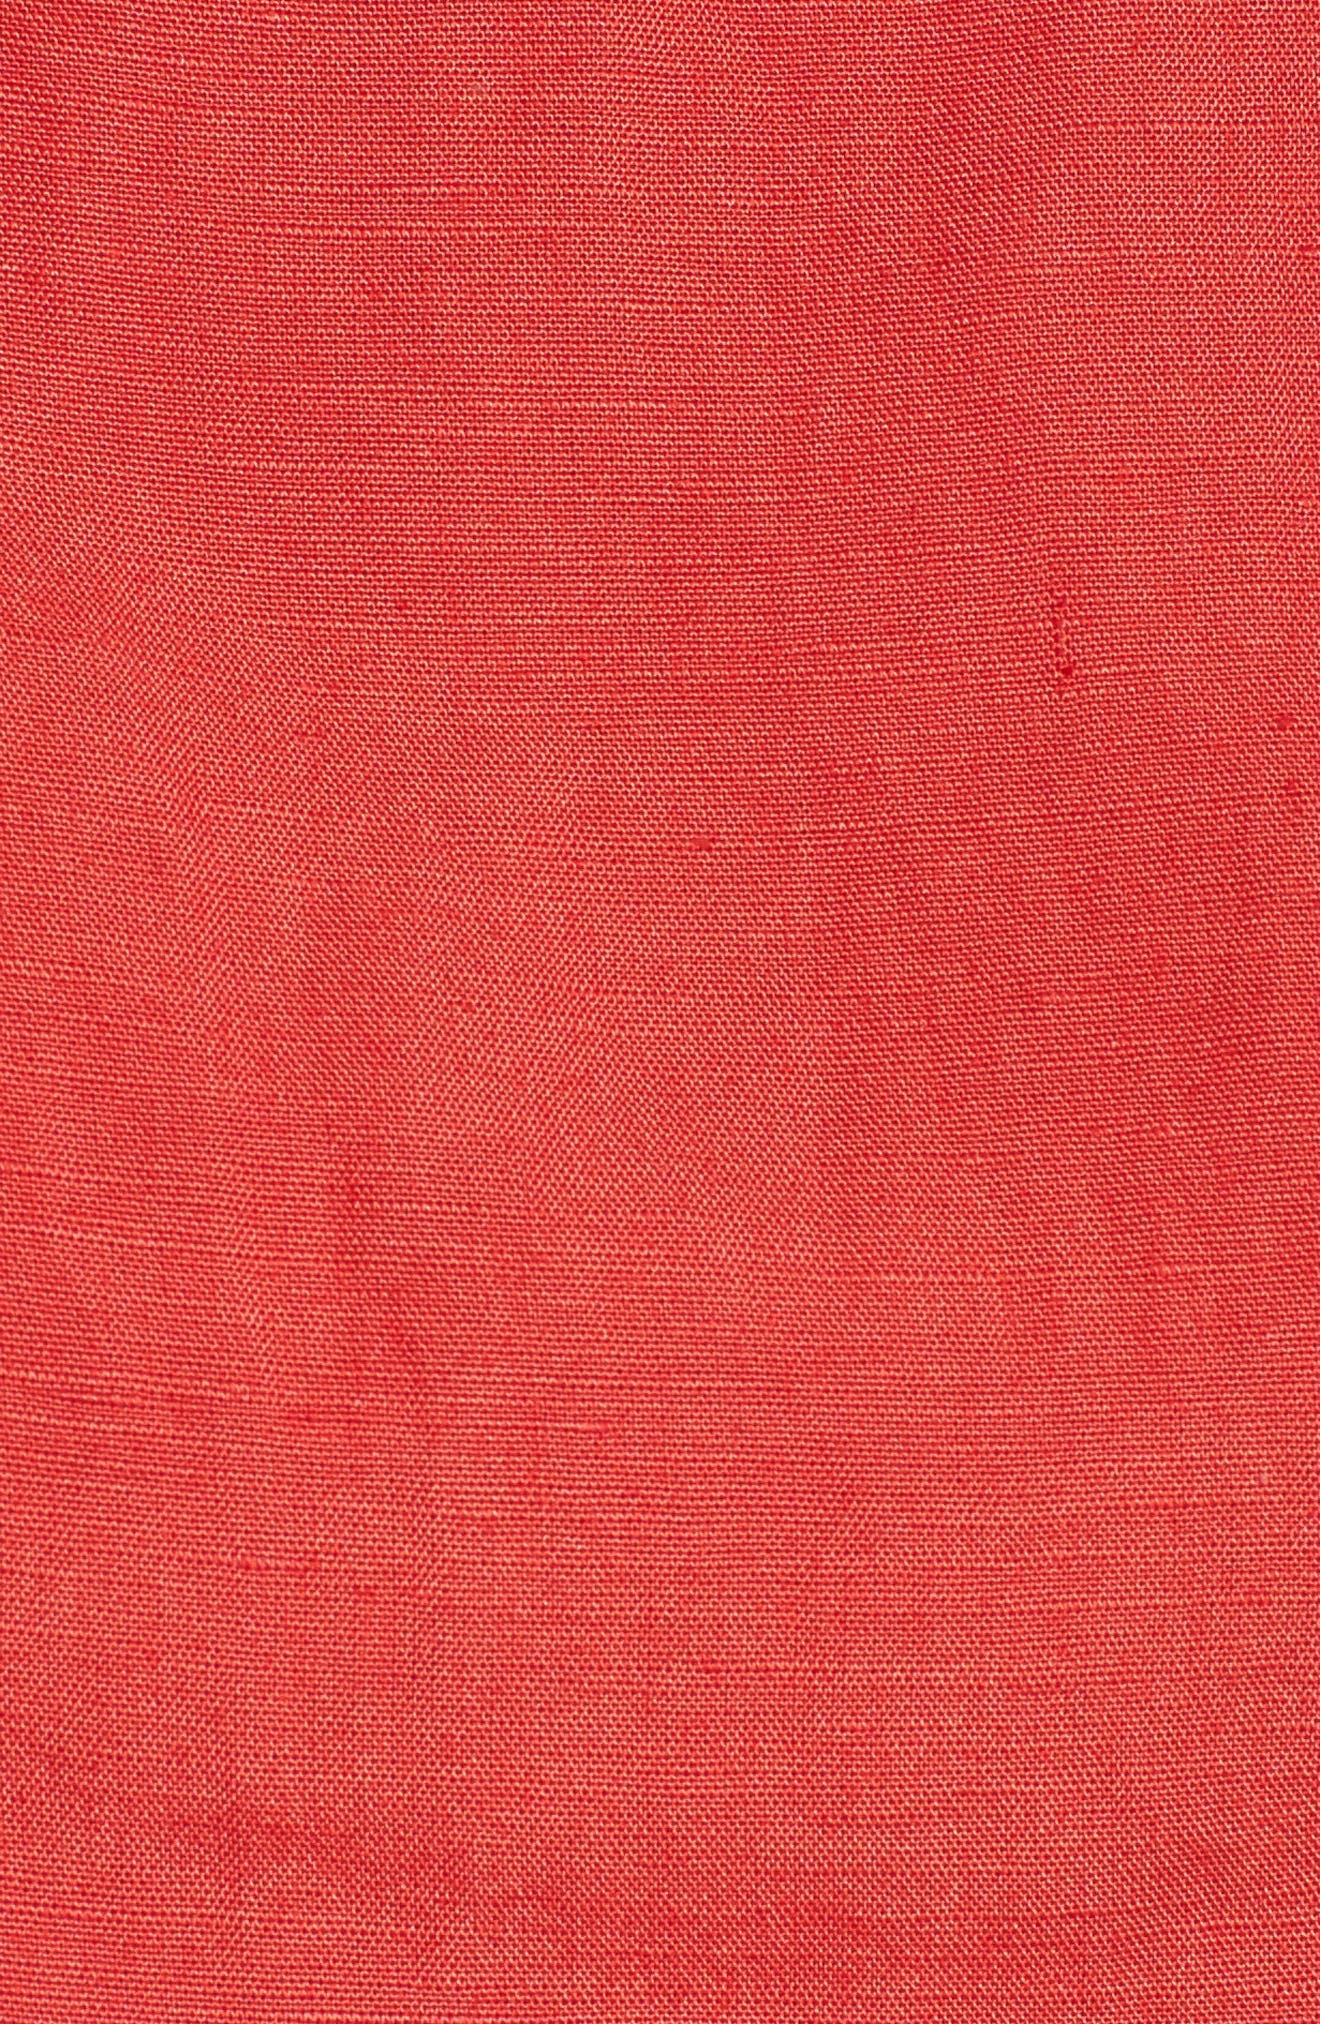 Linen Blend Crop Top,                             Alternate thumbnail 5, color,                             Bright Red